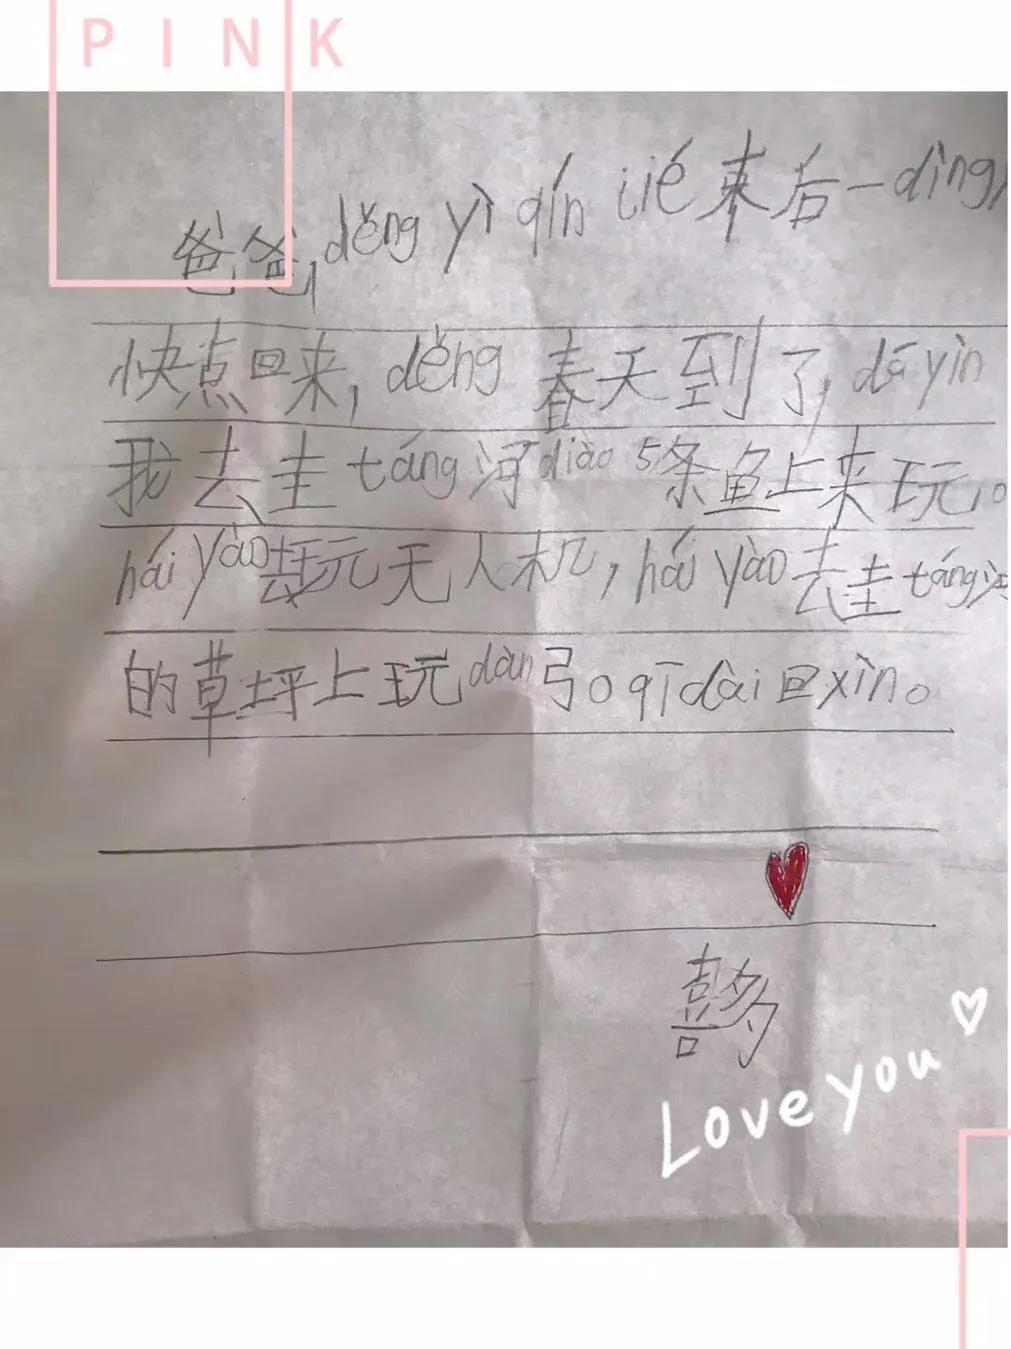 吴辉与儿子的手写信